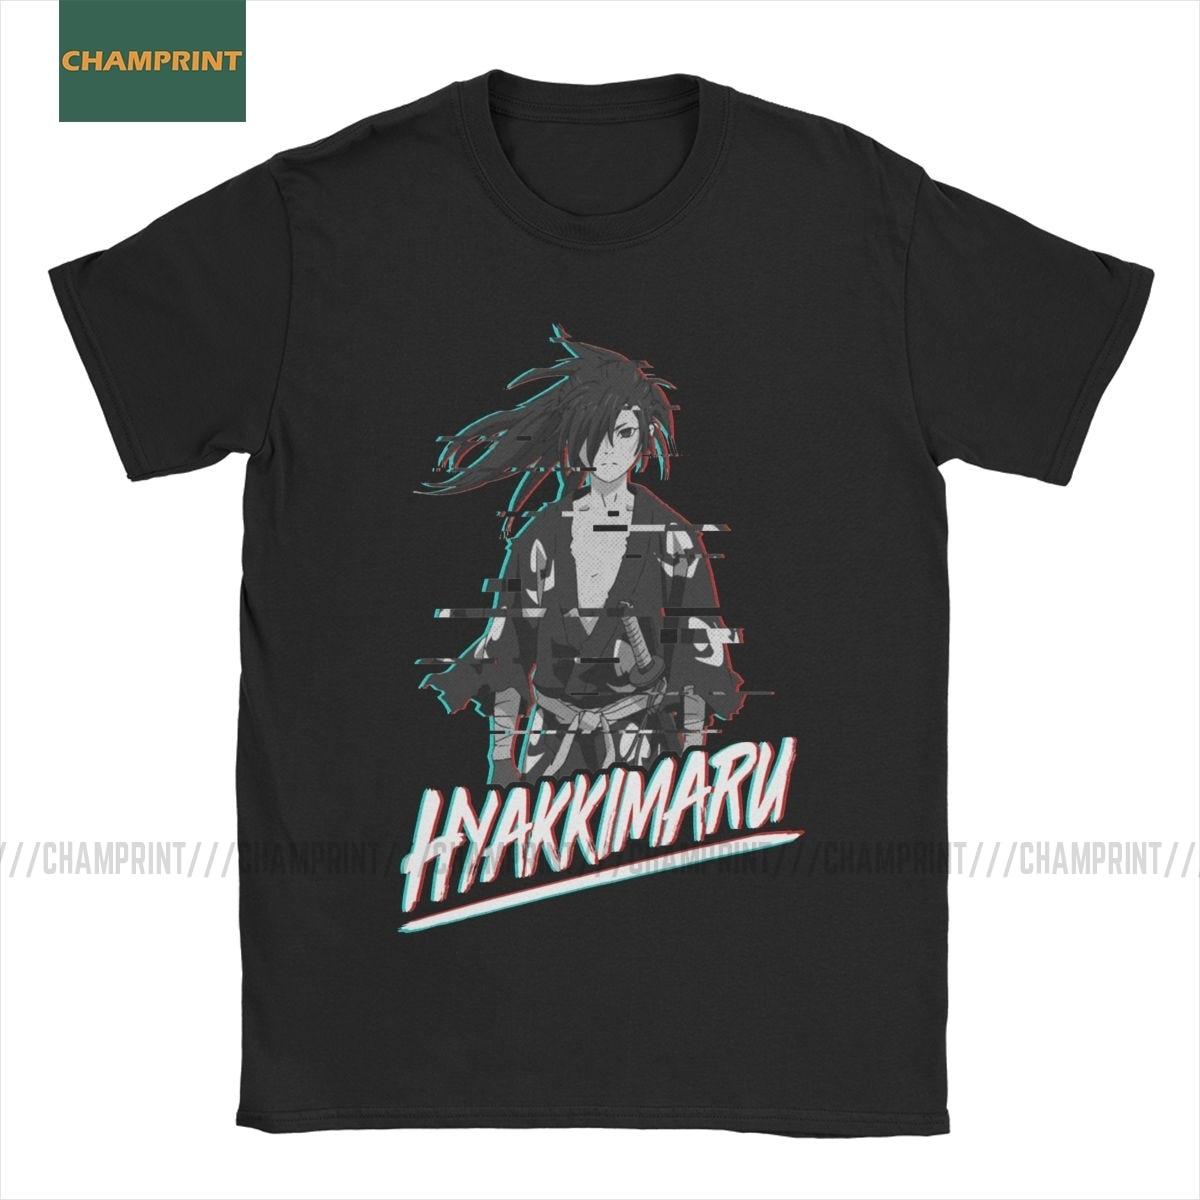 Camisetas Vintage Hyakkimaru Glitch Dororo, camisetas de algodón para hombres, camisetas de Manga corta de Anime Sword Naruto Demon Katana, camisetas de talla grande